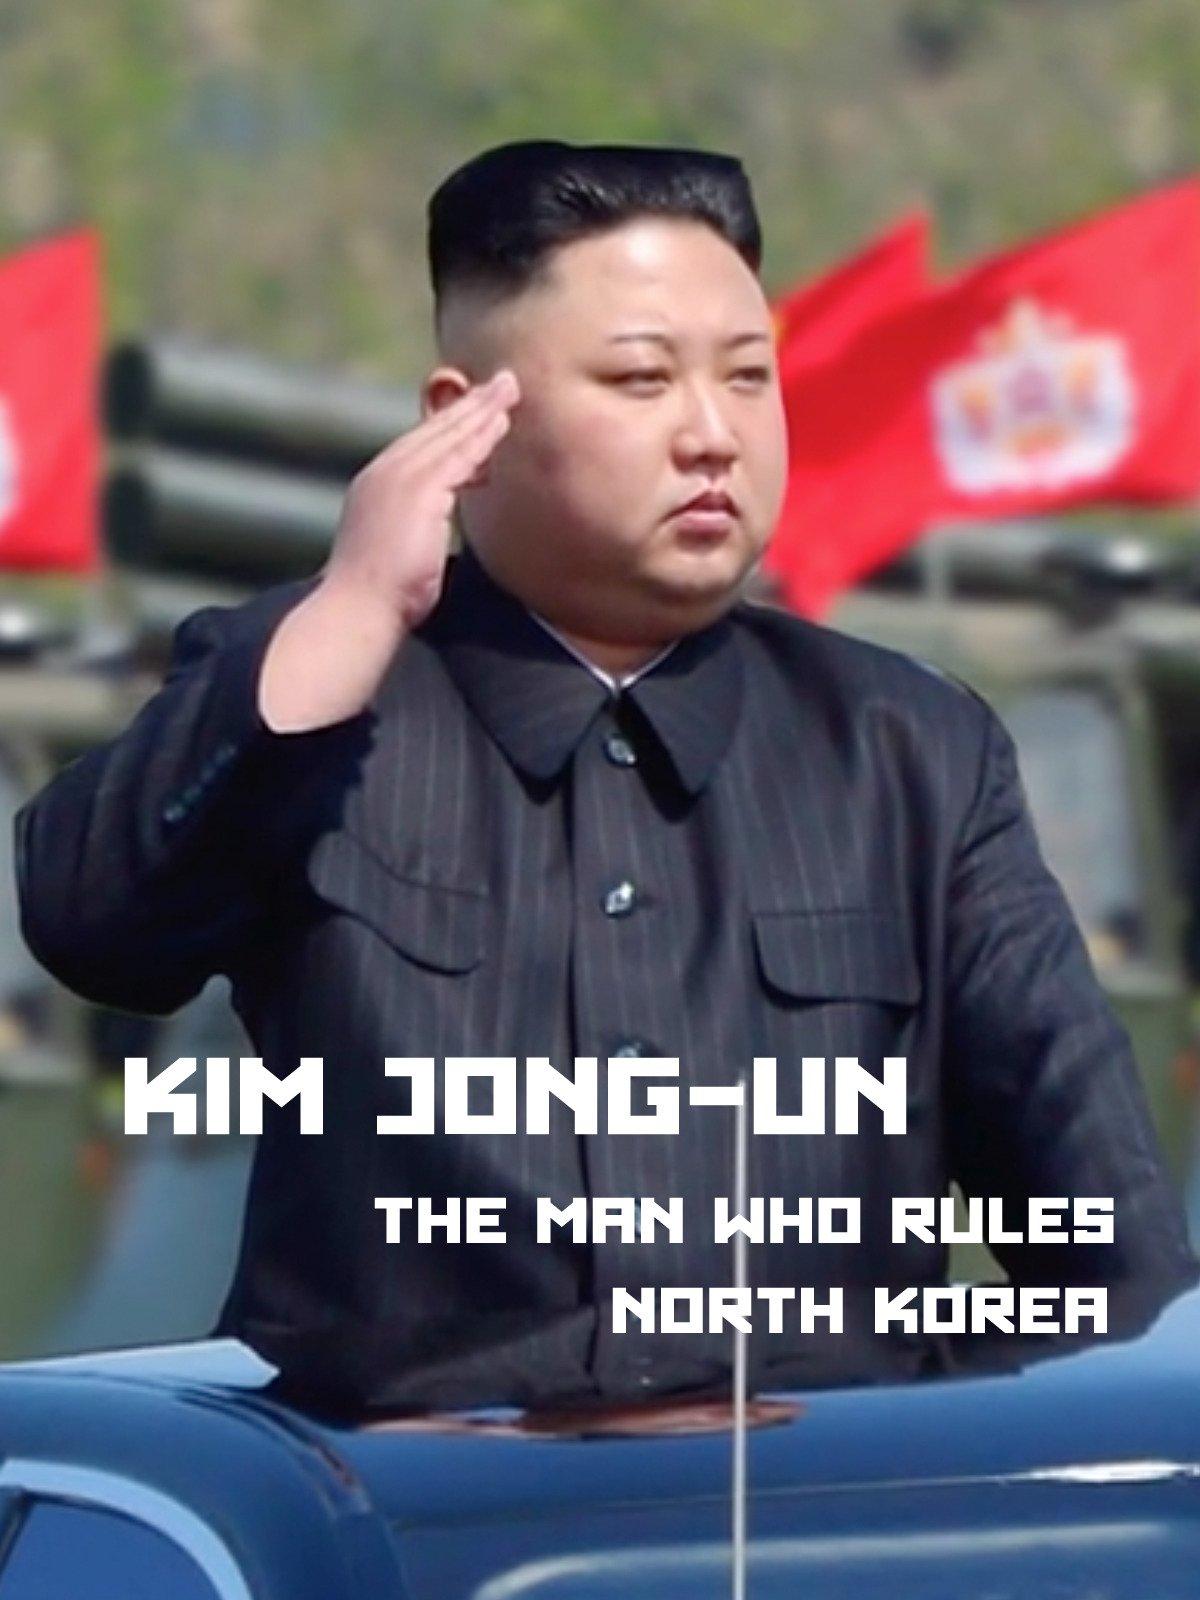 Kim Jong-Un: The Man who rules North Korea on Amazon Prime Video UK